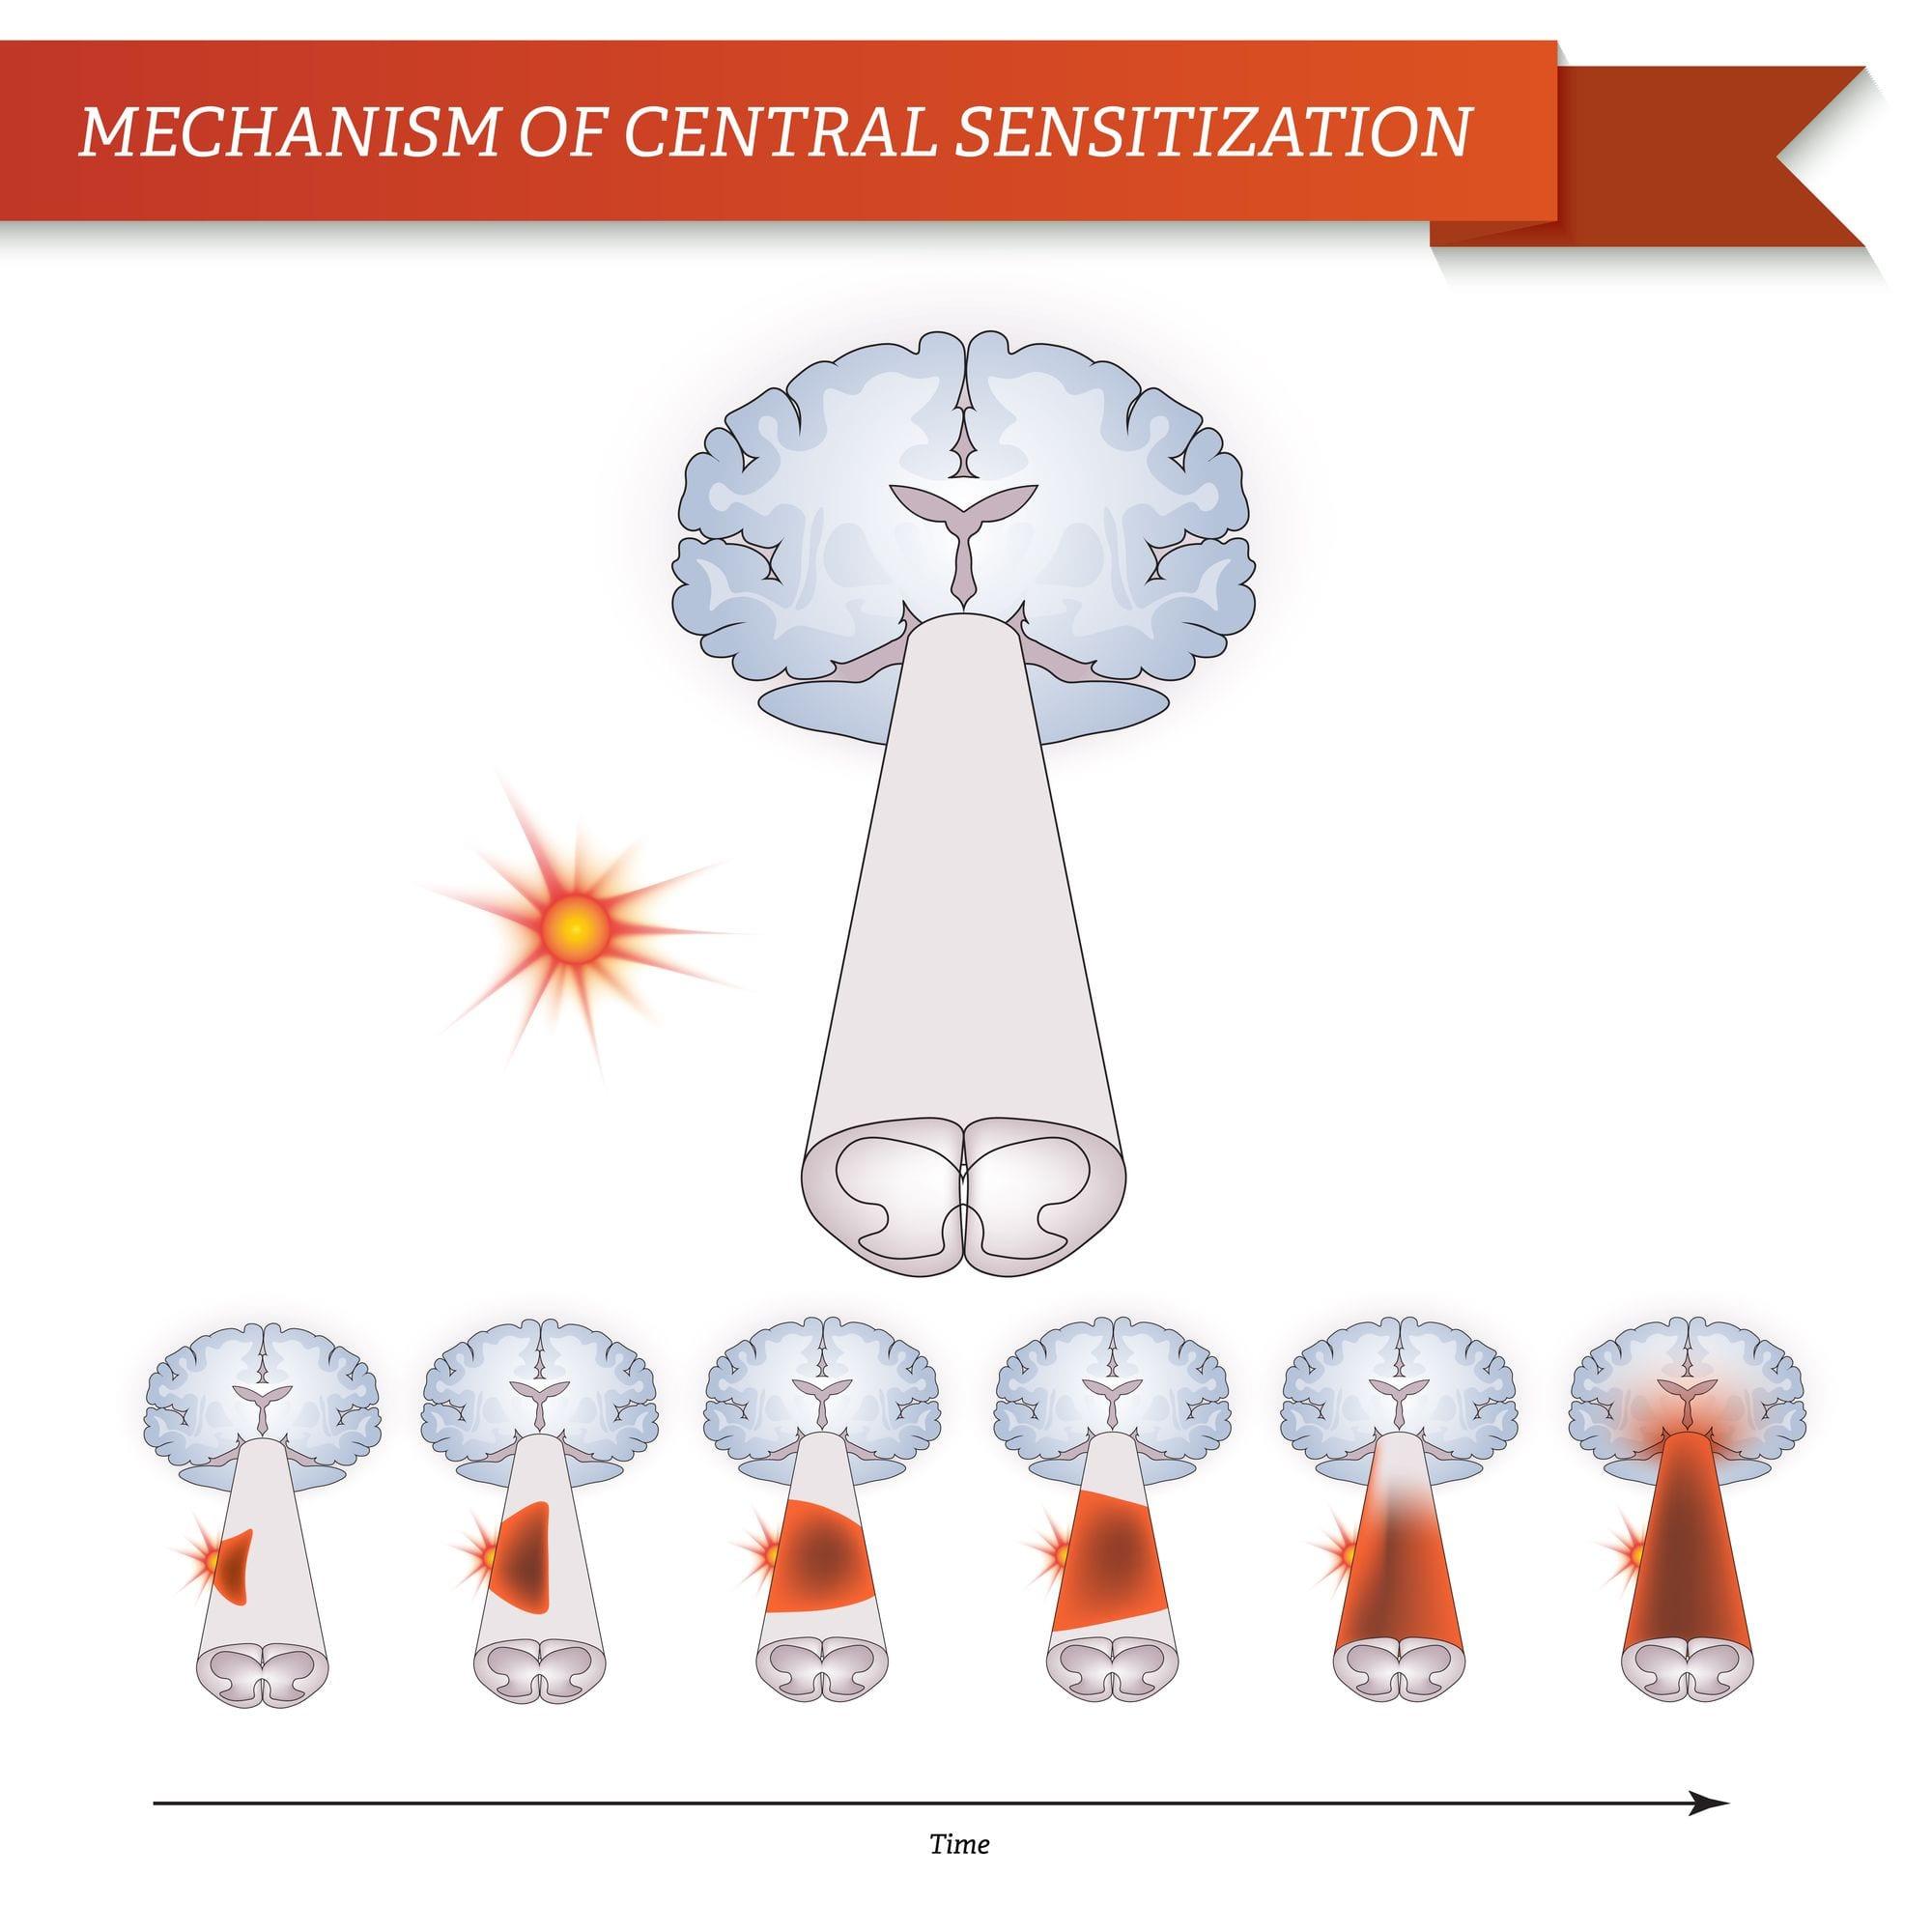 Mechanism of Central Sensitization   El Paso, TX Chiropractor